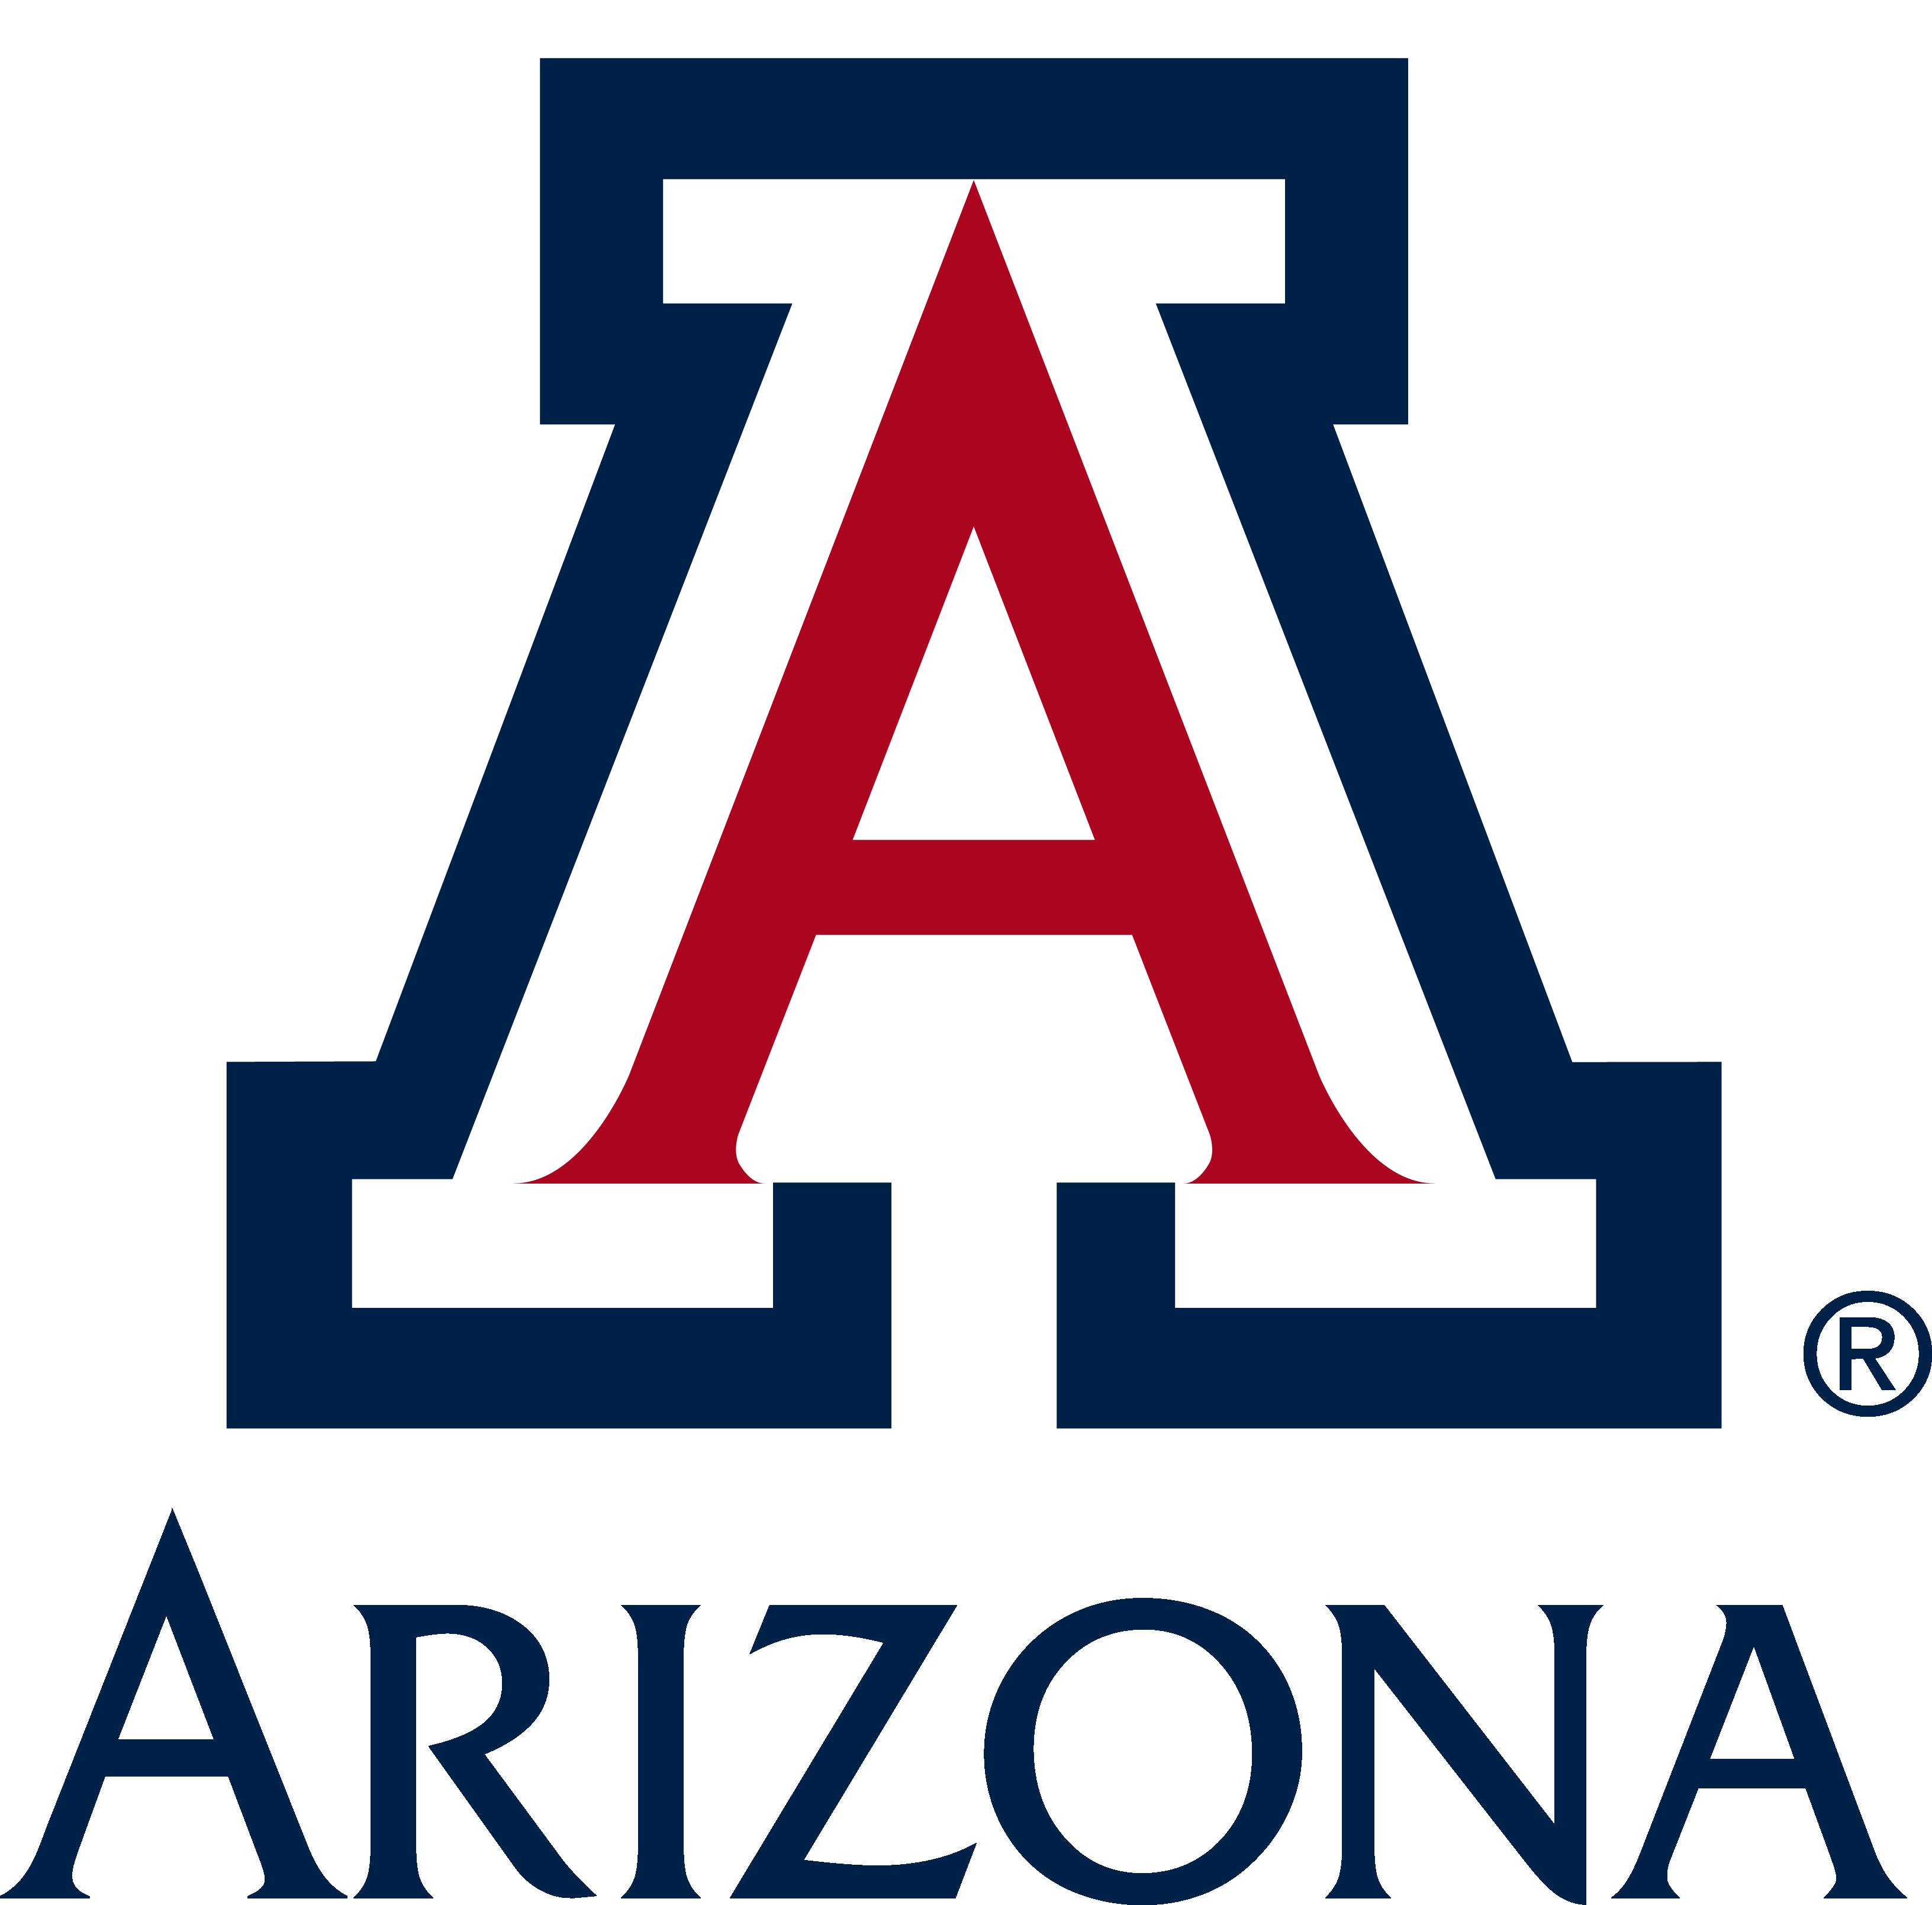 University of Arizona - Magazine cover